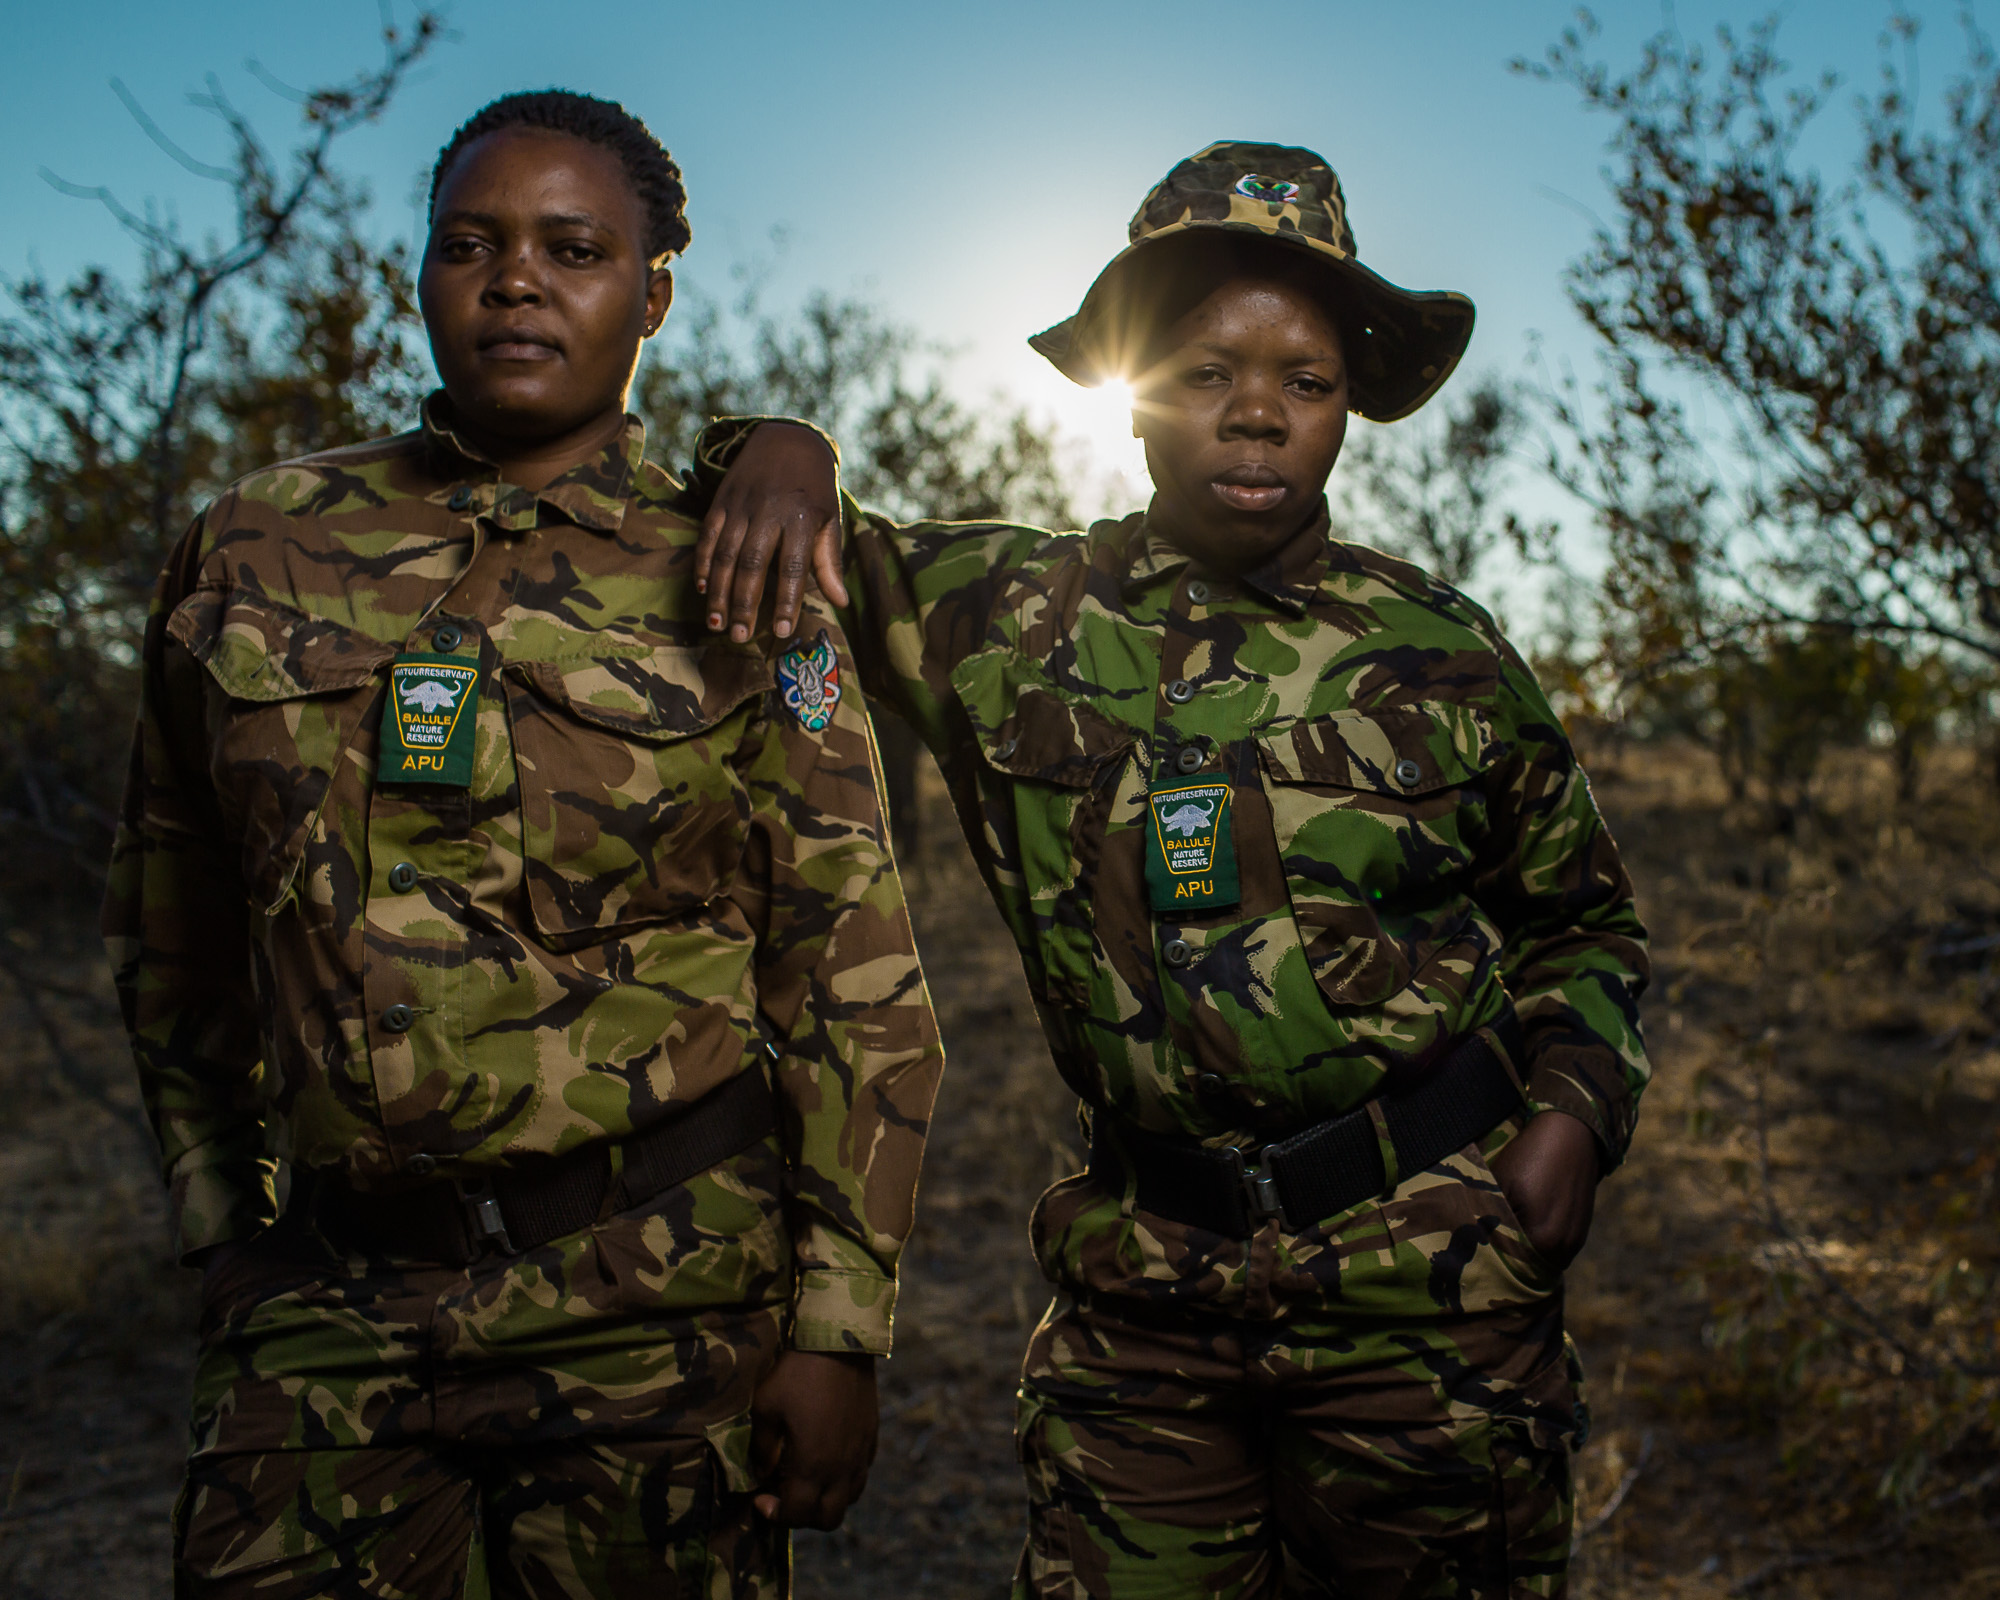 Dedeya Nkwinika and Proud Mkansi,Felicia Mogakane,members of the Black Mamba anti-poaching unit in Balule Game Reserve.